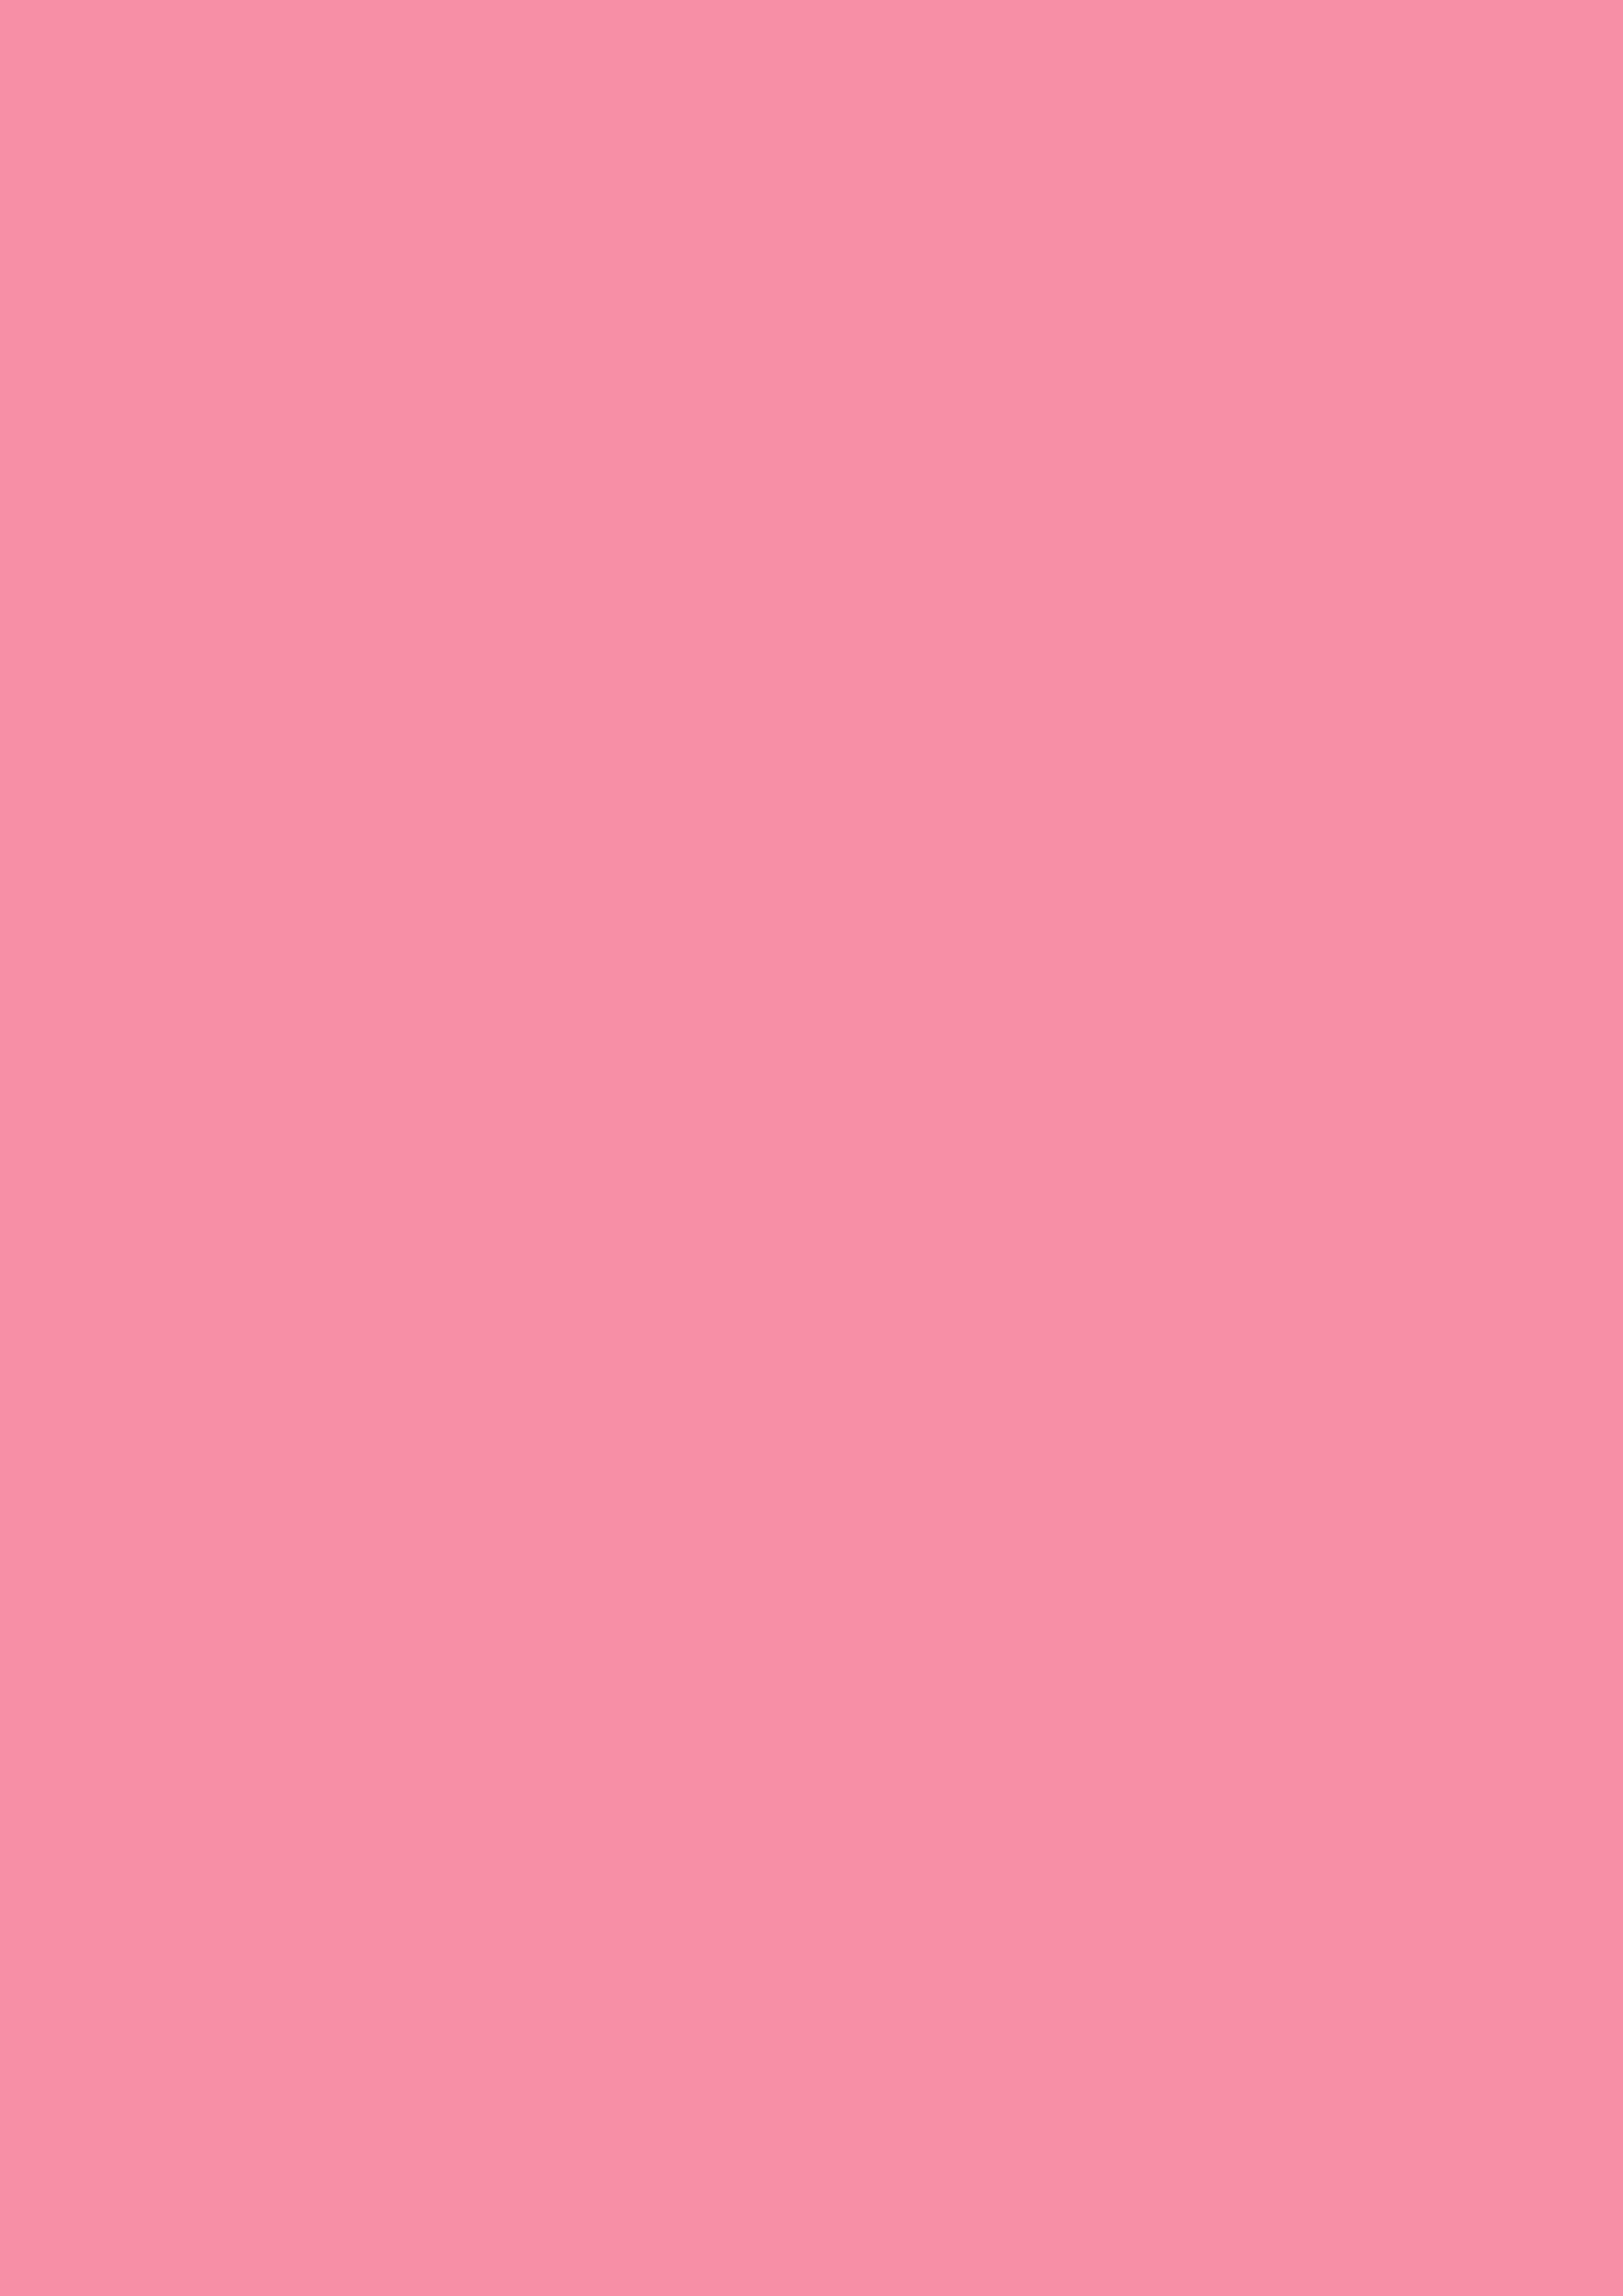 2480x3508 Pink Sherbet Solid Color Background